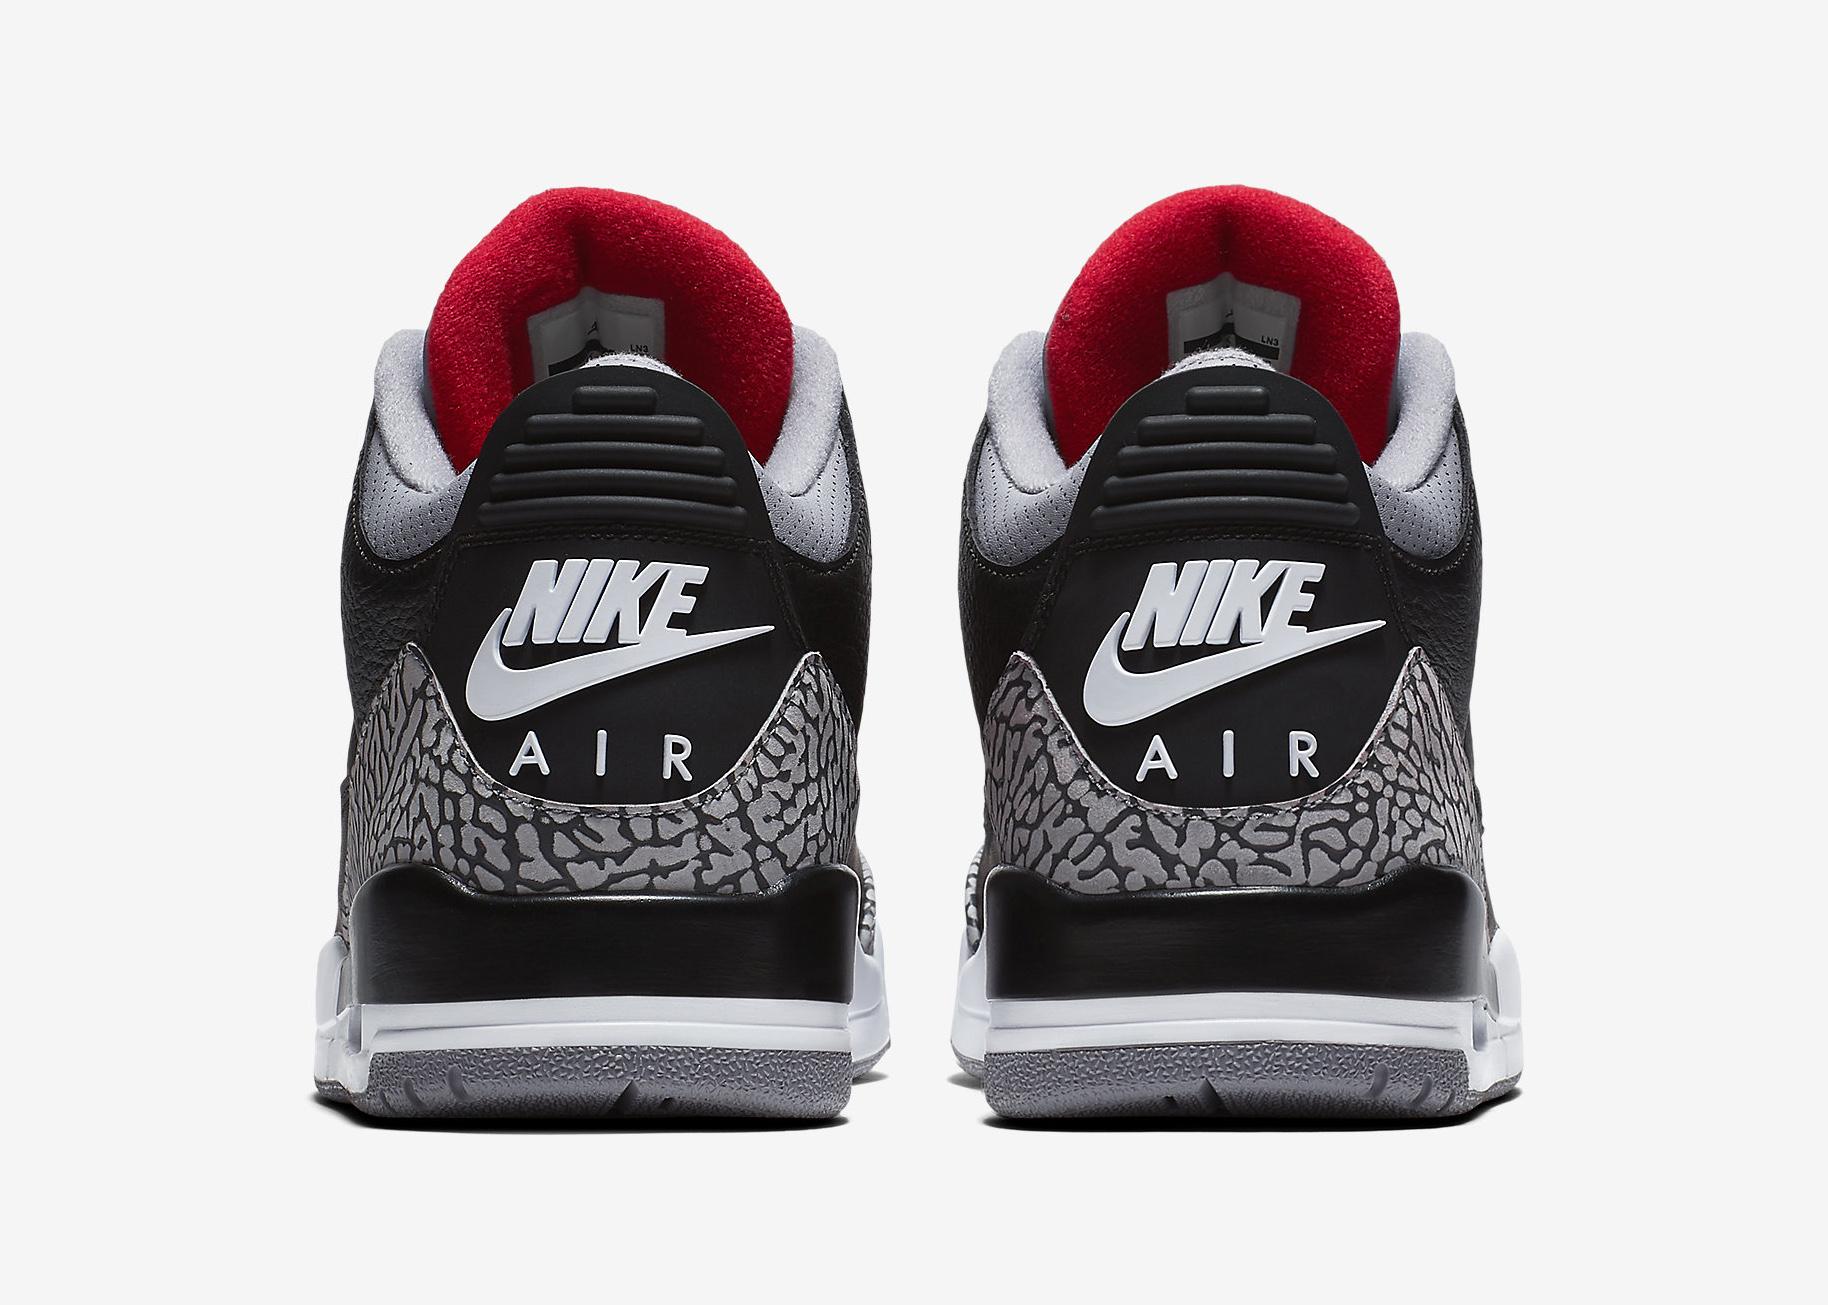 "Nike Air"" on the Air Jordan 3"